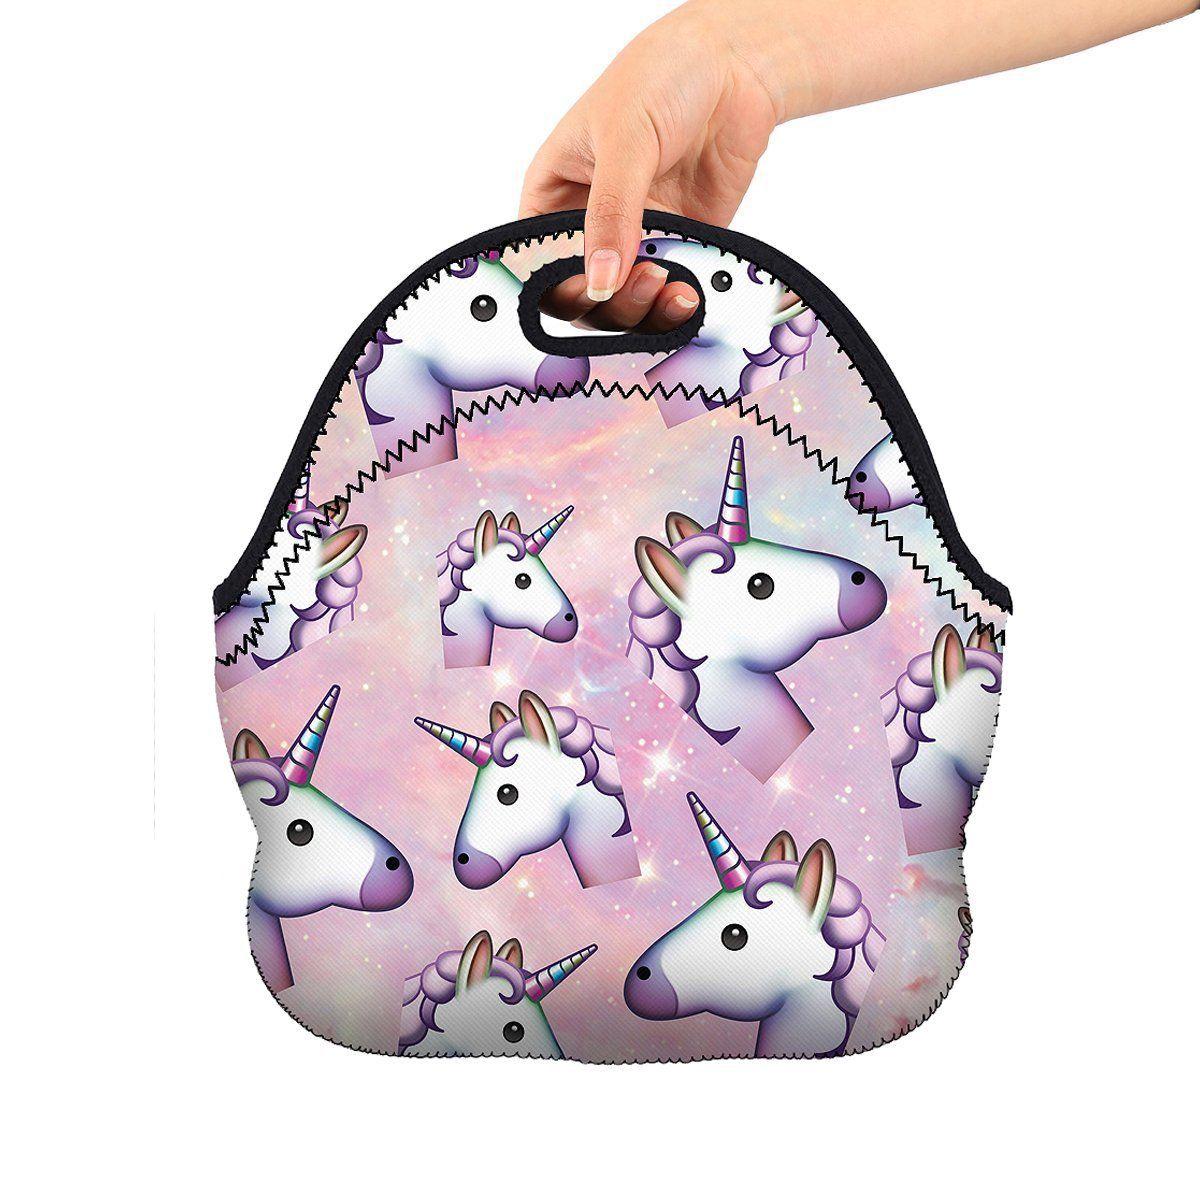 8acffc525686 Kids Soft Friendly Insulated unicorn Lunch box Food Bag Neoprene Gourmet  Handbag lunchbox Cooler warm Pouch Tote bag For School work